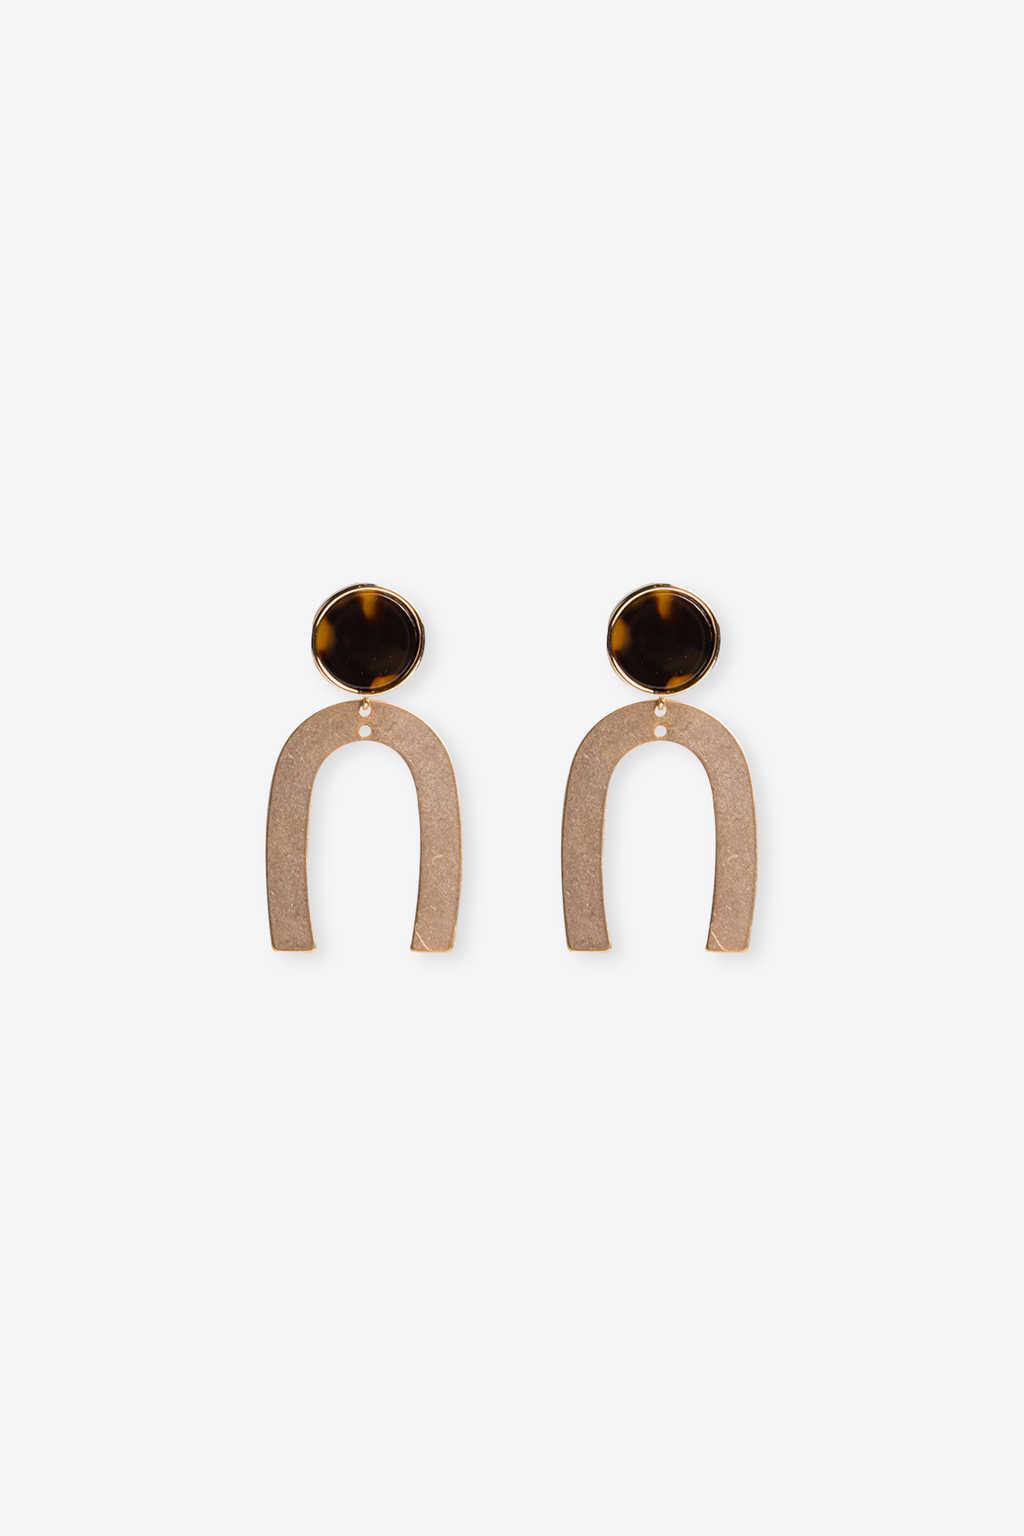 Earring H304 Gold 1